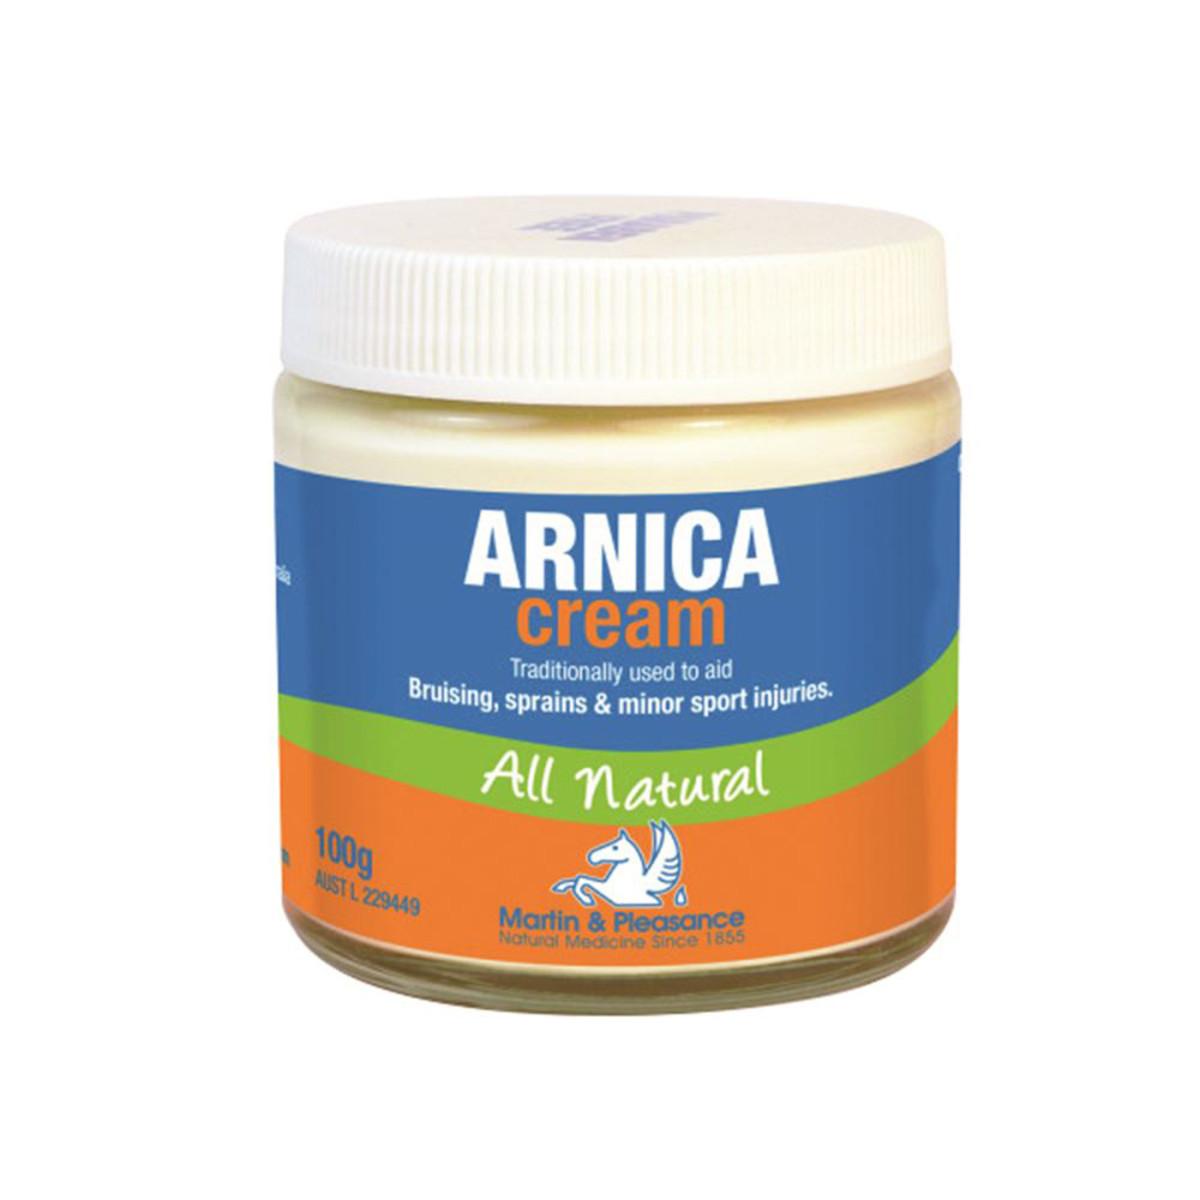 Image of Martin & Pleasance Arnica cream 100g